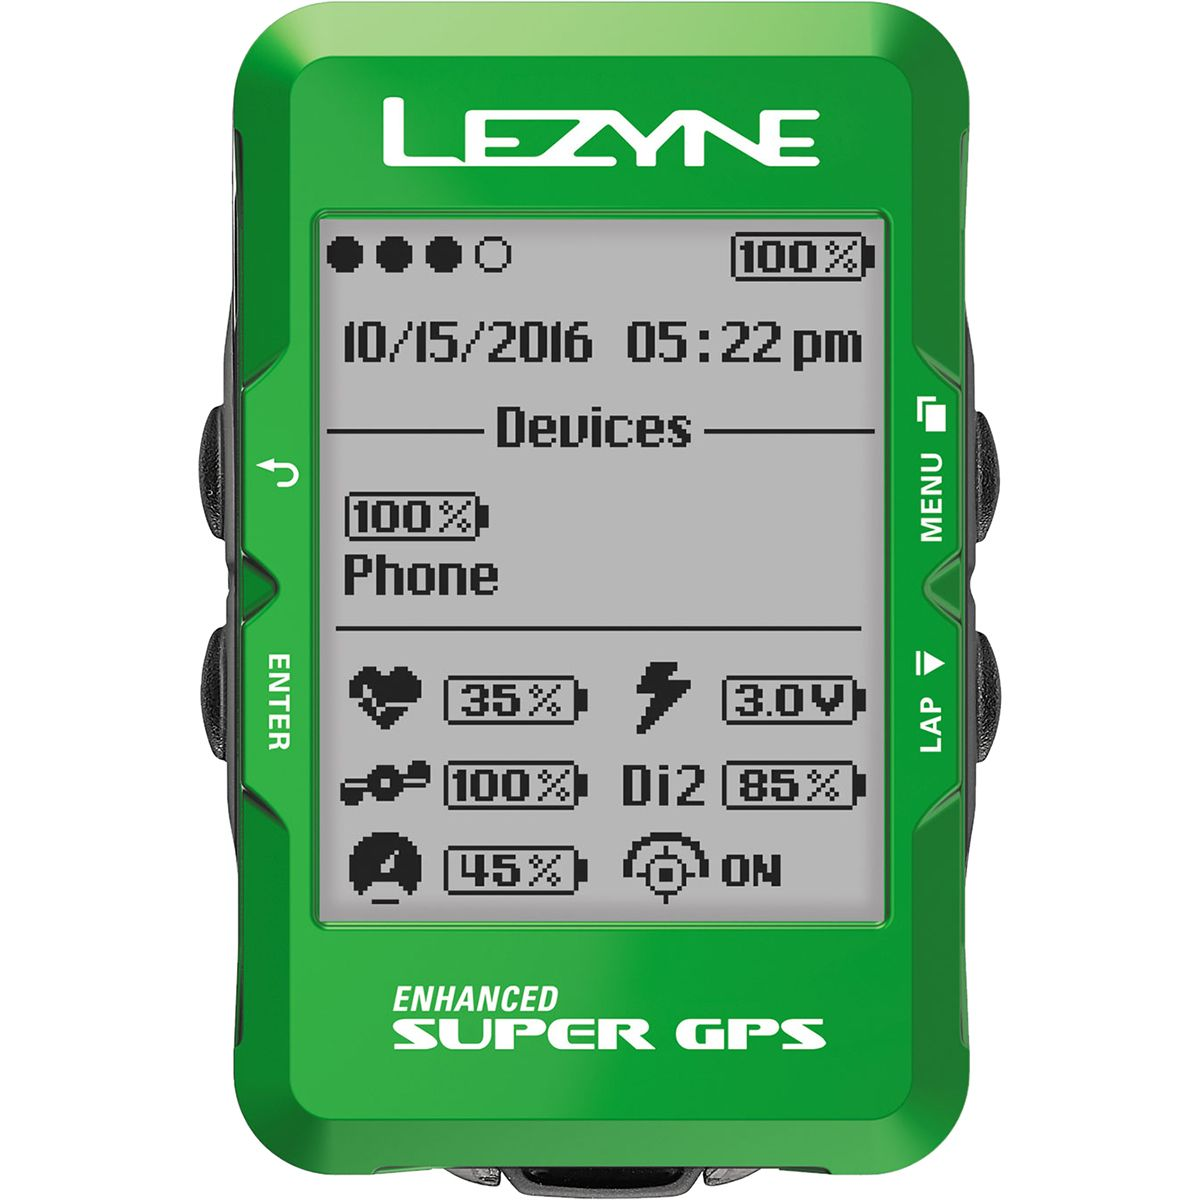 Lezyne Super Limited Holiday Edition GPS Bike Computer